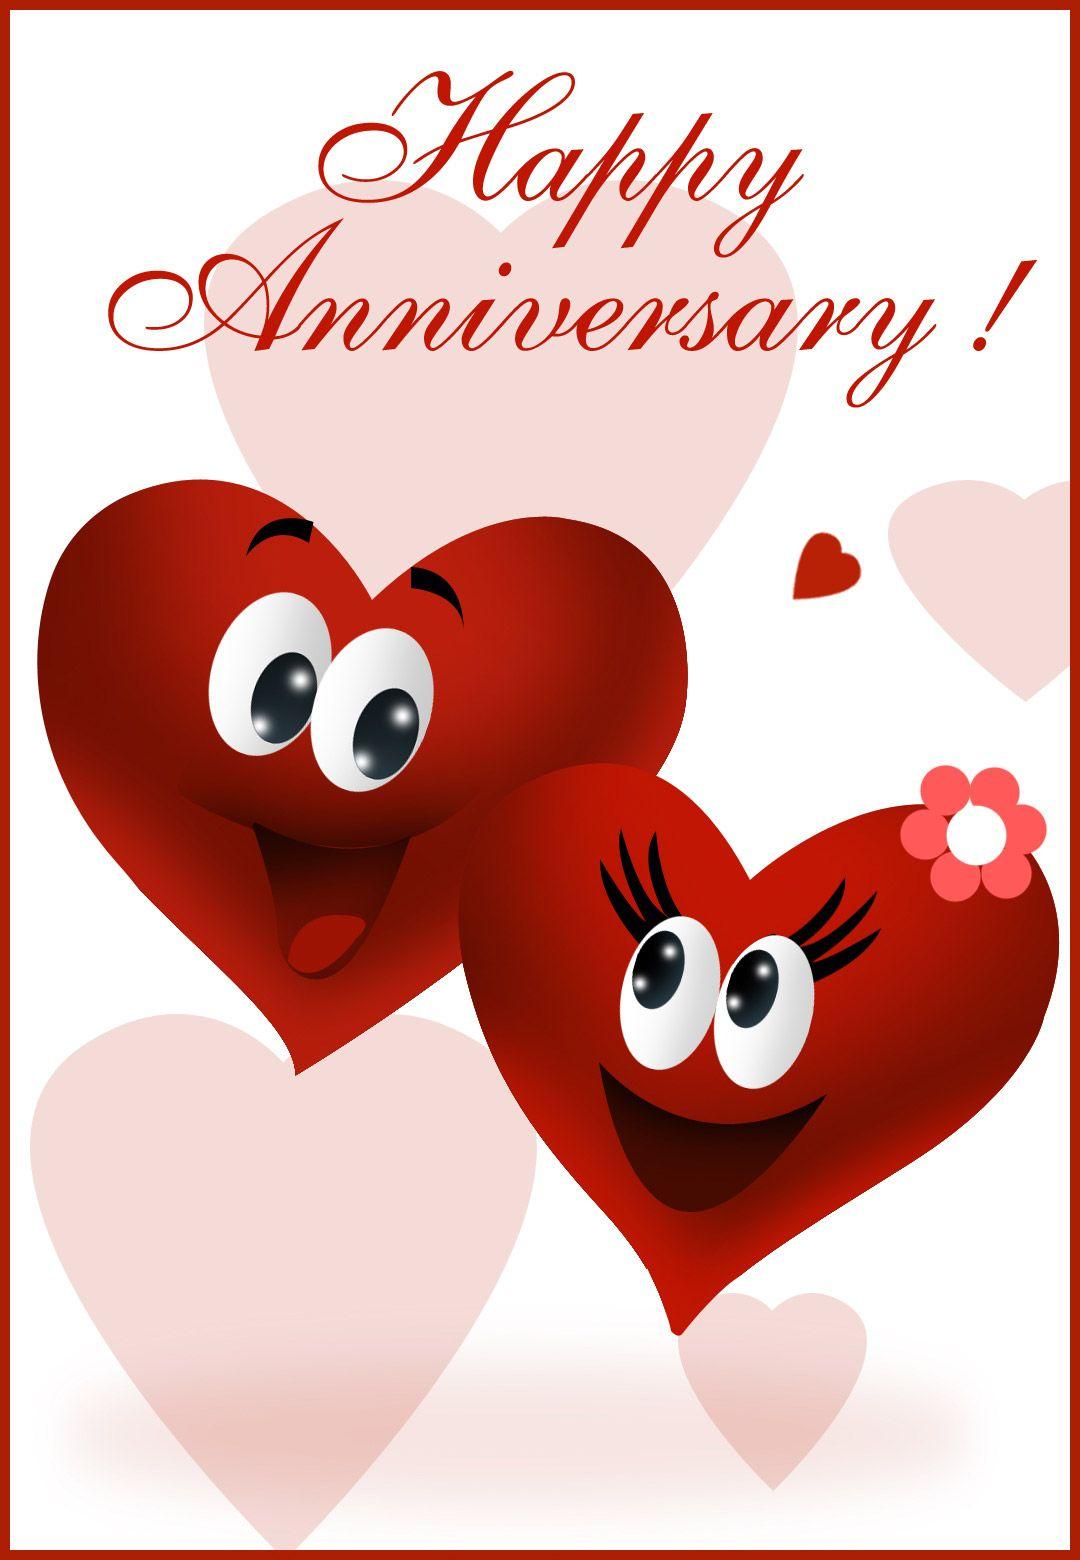 Free Printable Happy Anniversary Greeting Card | Anniversary - Free Printable Love Greeting Cards